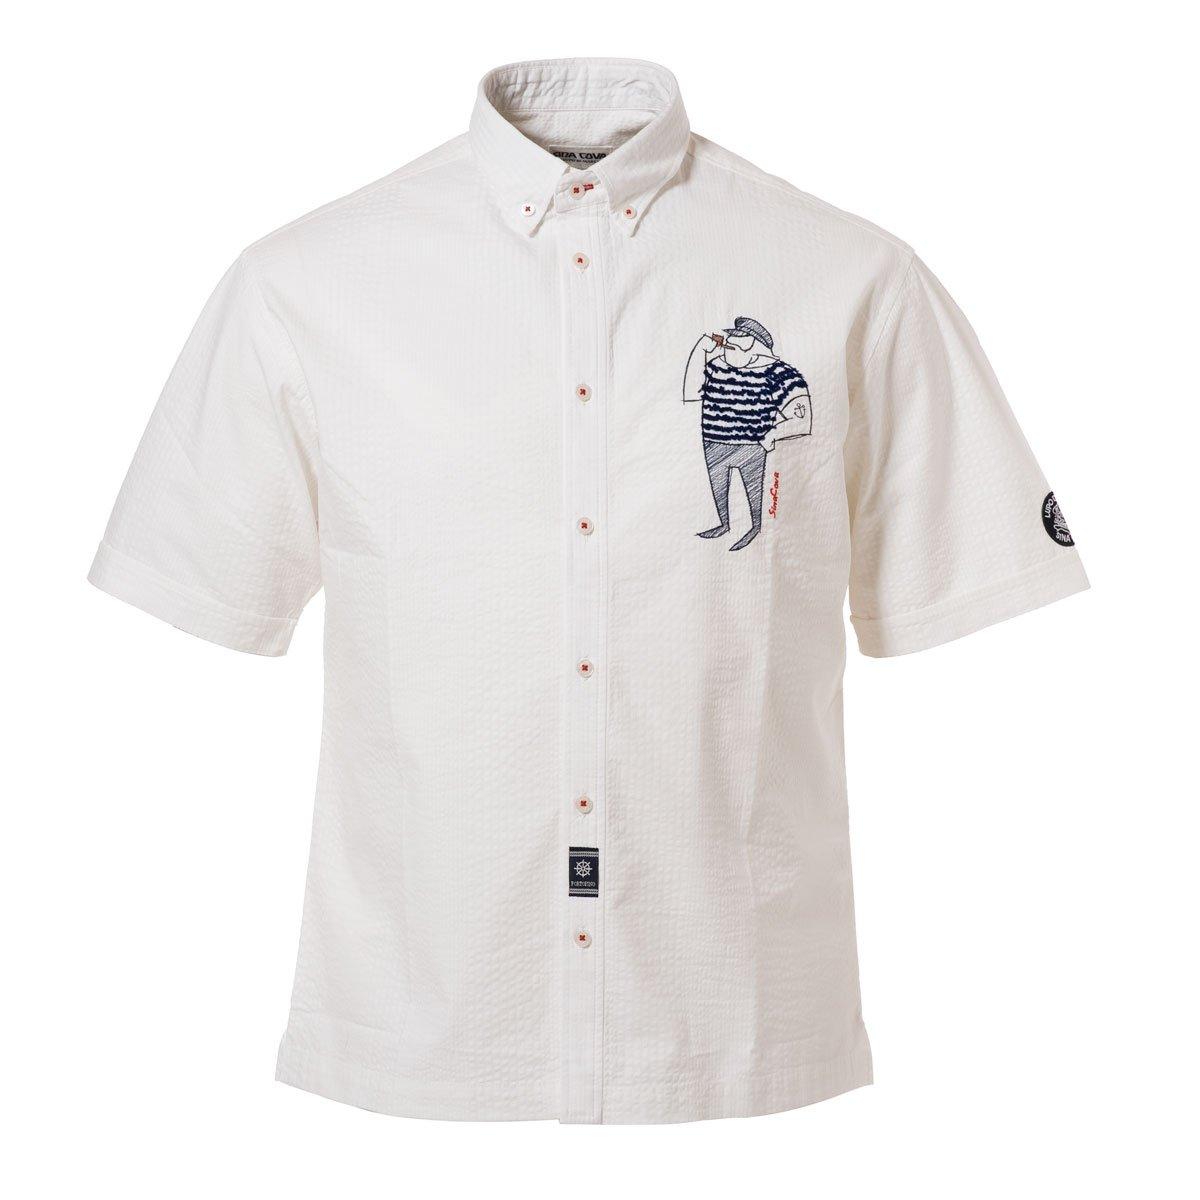 Cova SINACOVA 18134510 Men's Short Sleeve Shirt White X-Large